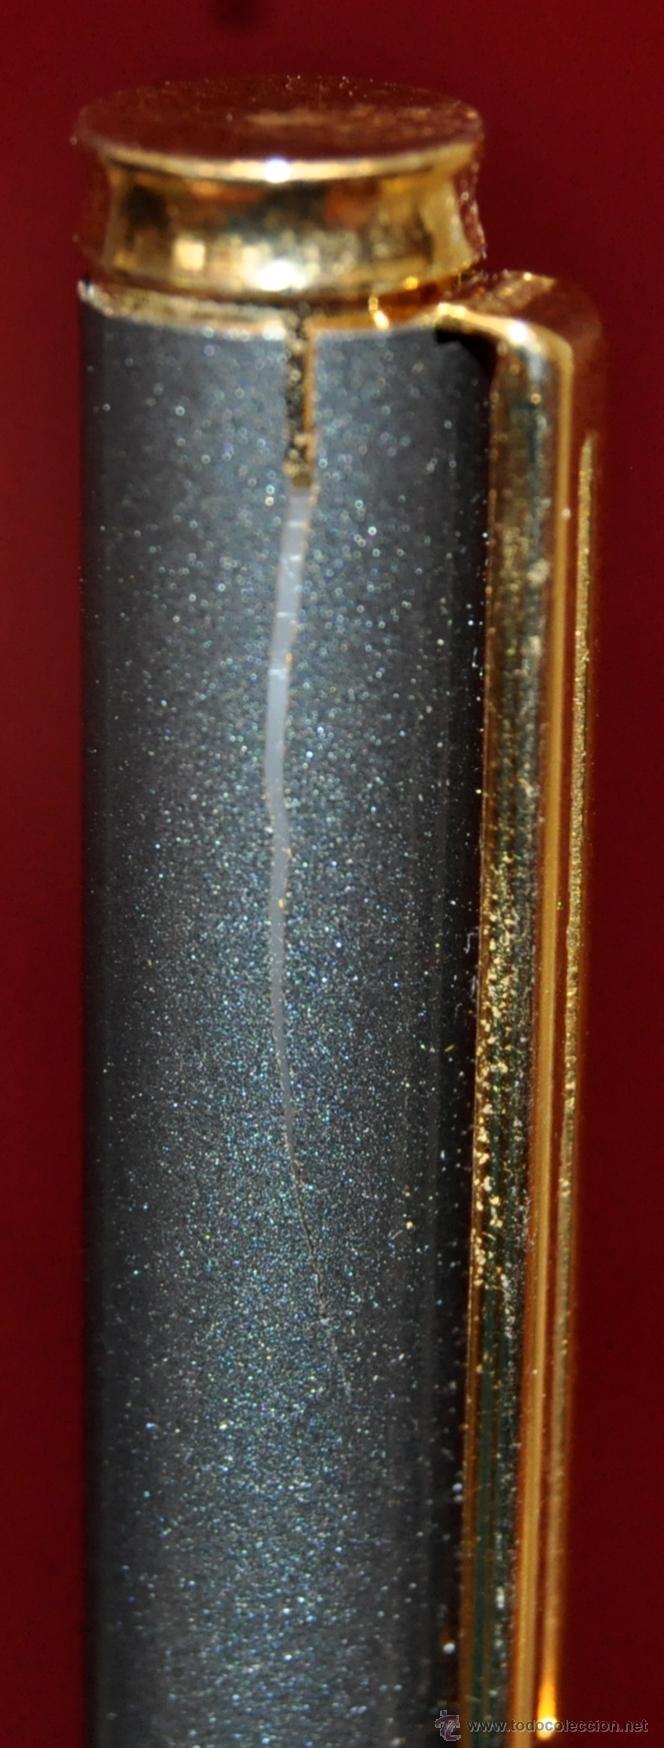 Plumas estilográficas antiguas: ANTIGUA PLUMA DE FABRICACION ALEMANA IRIDIUM POINT. AÑOS 50-60 - Foto 2 - 45307354